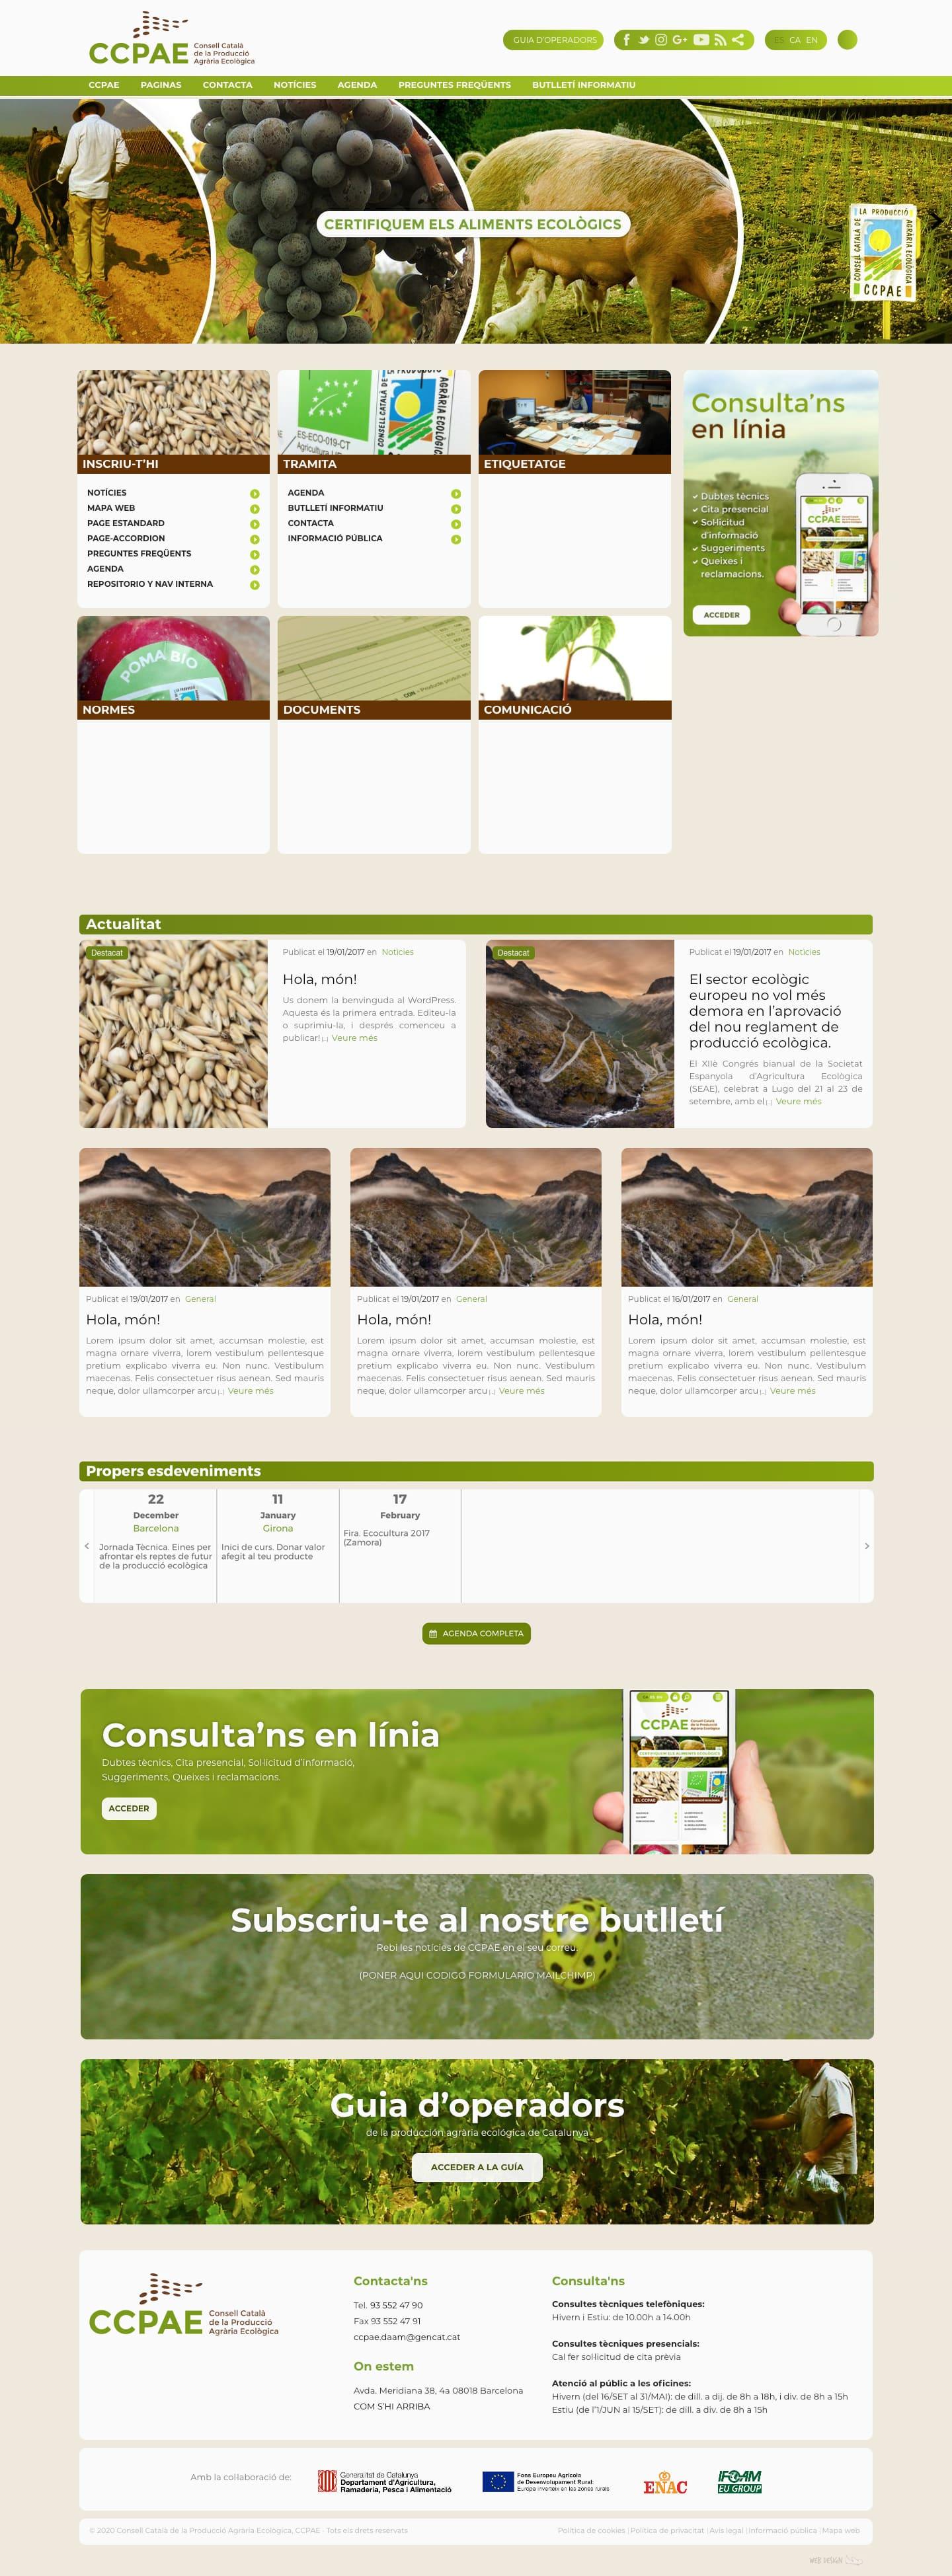 diseño web CCPAE